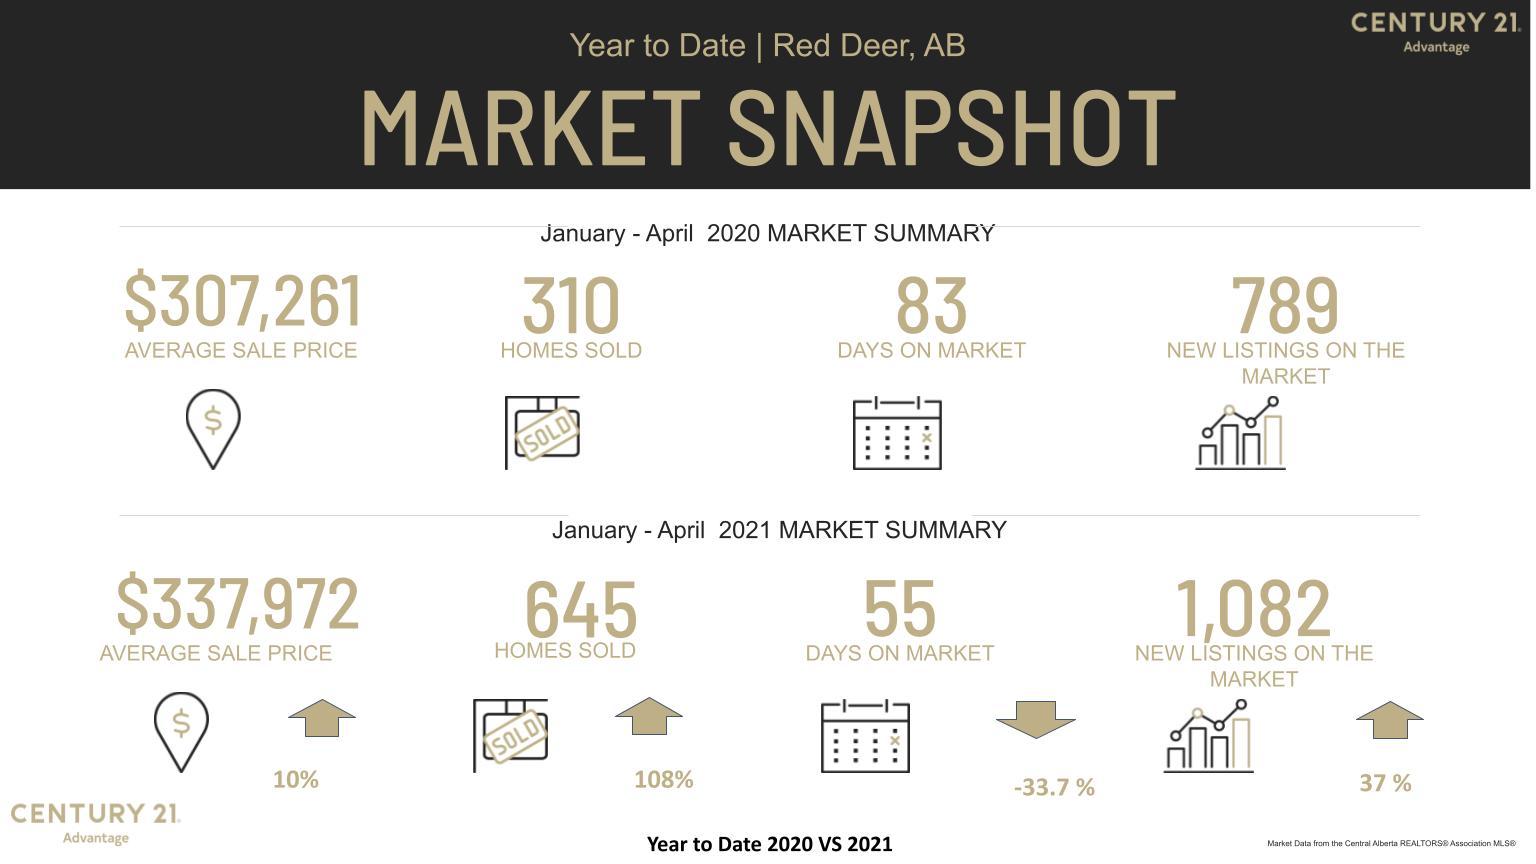 Red Deer Real Estate Market 2020 YTD versus 2021 YTD MLS Stats from Century 21 Advantage